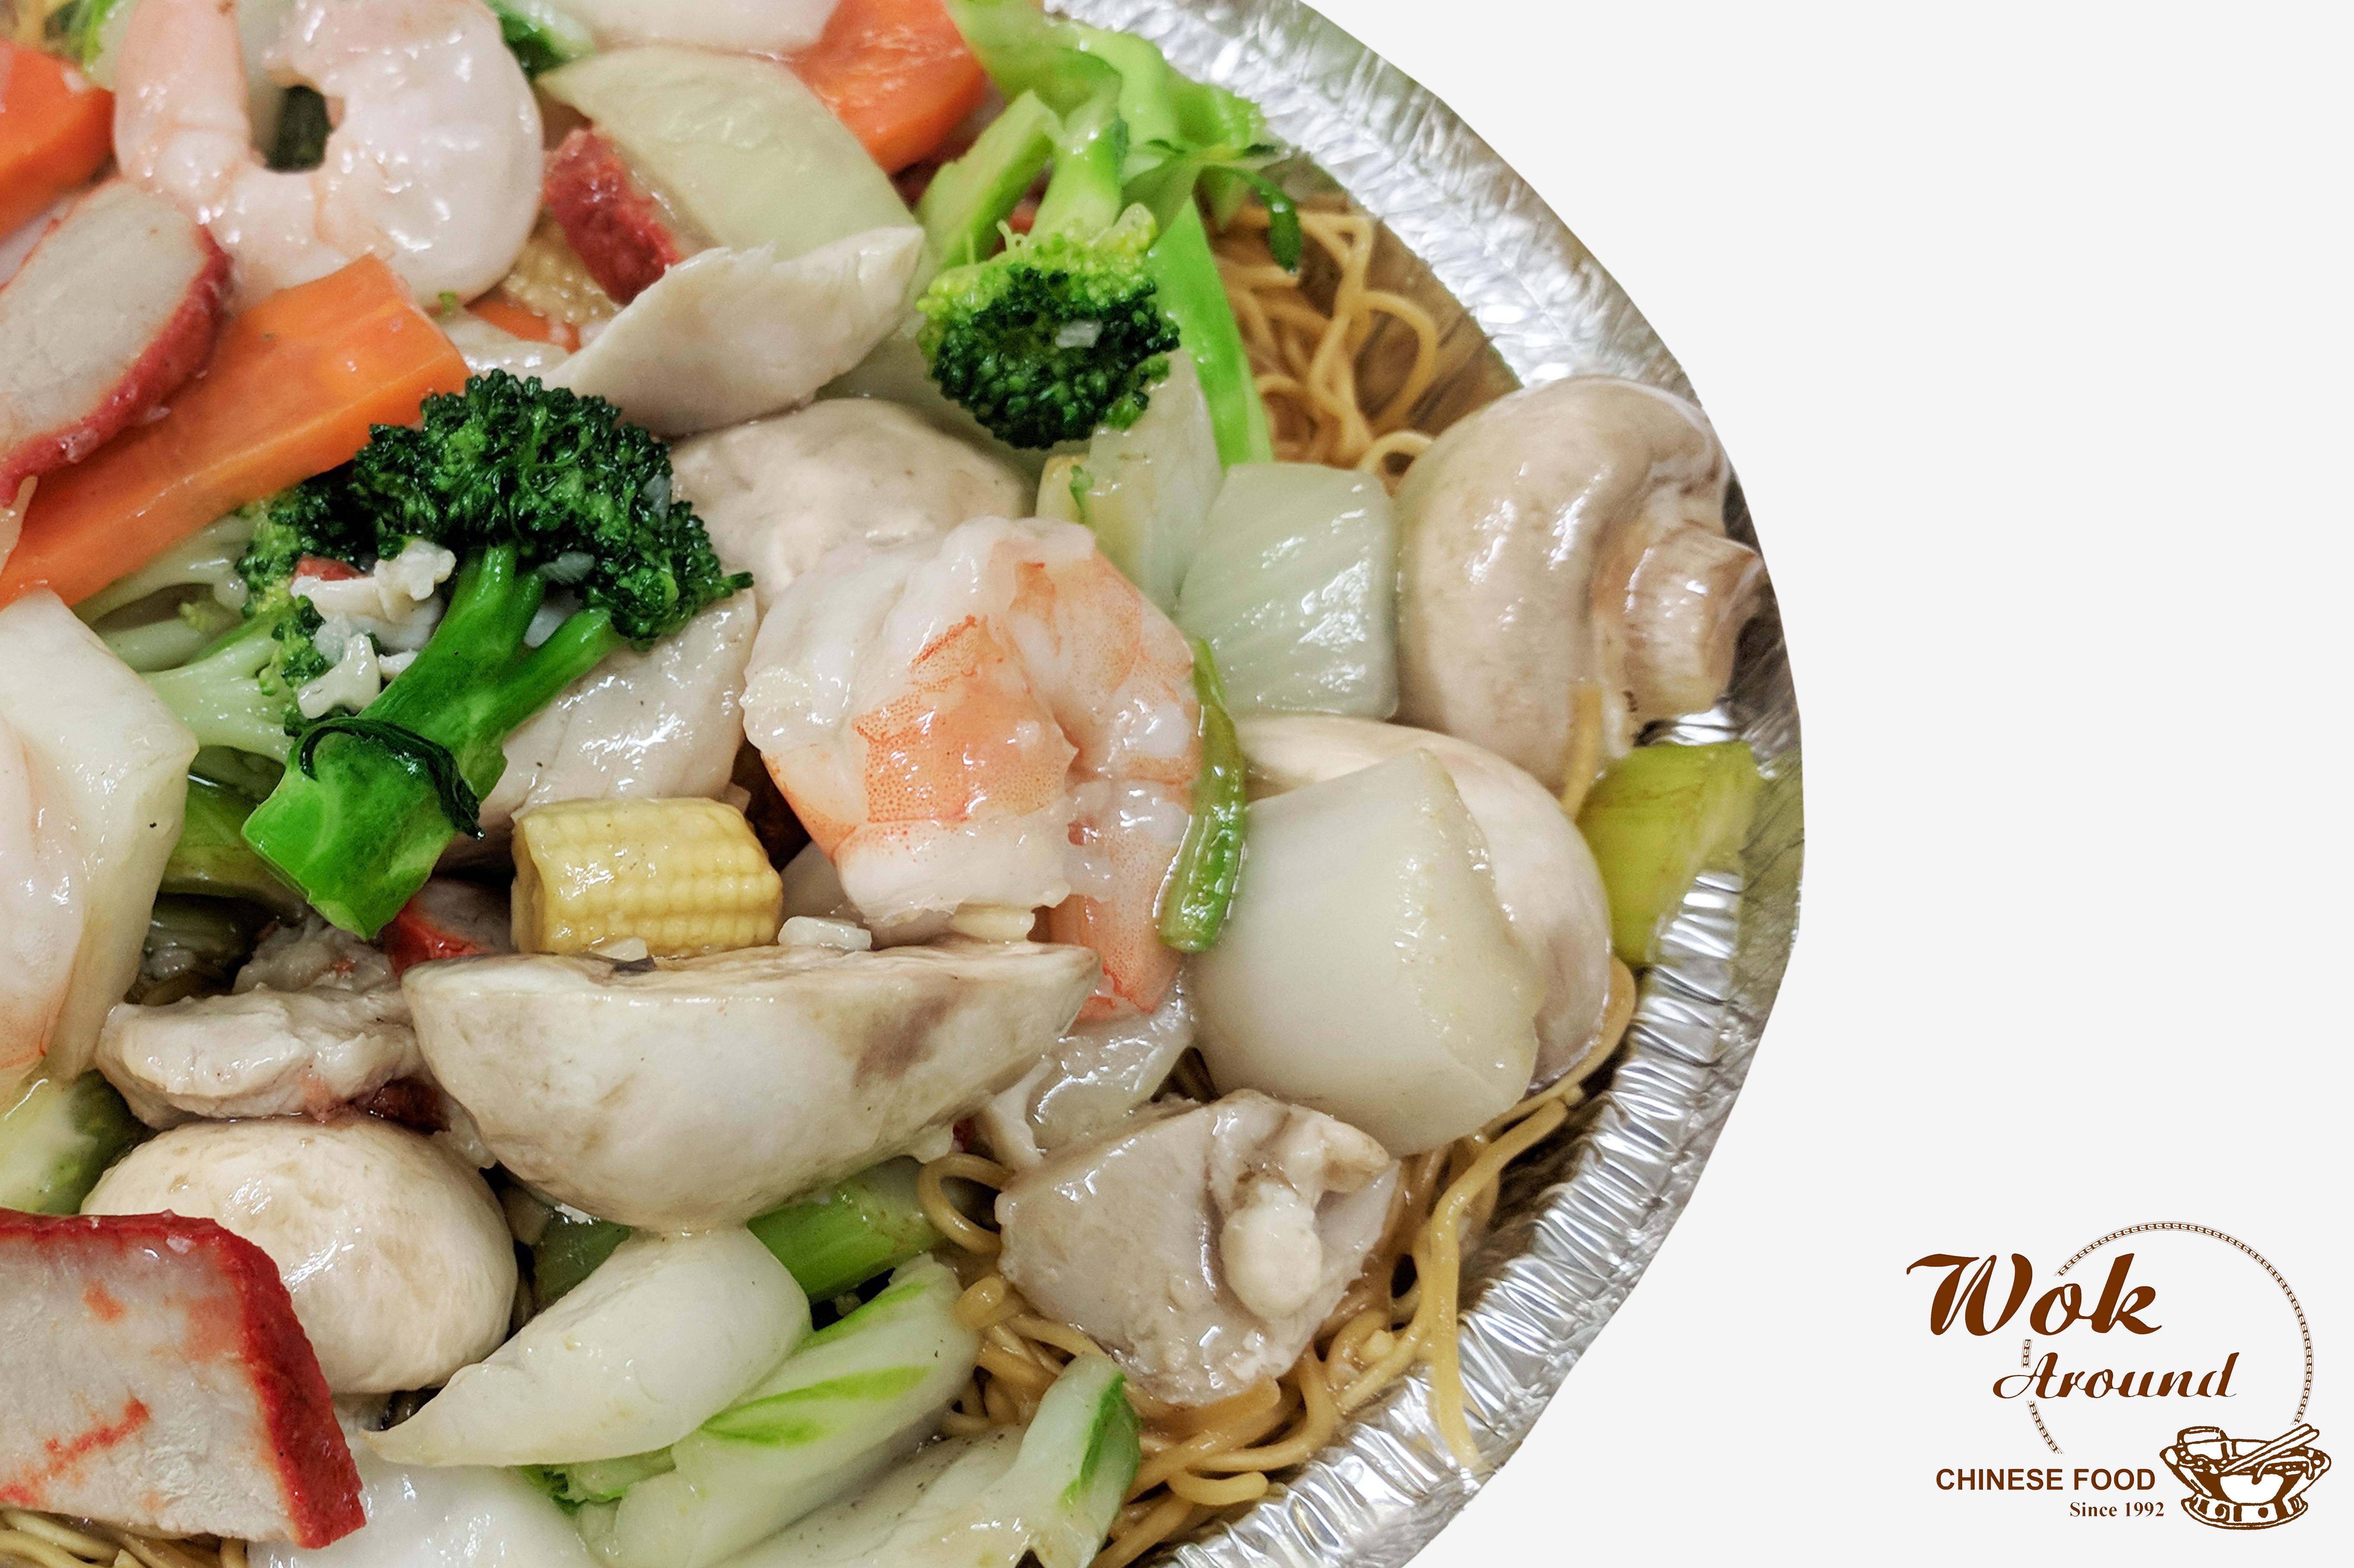 Wok Around Chinese Restaurant – Since 1992, we have been